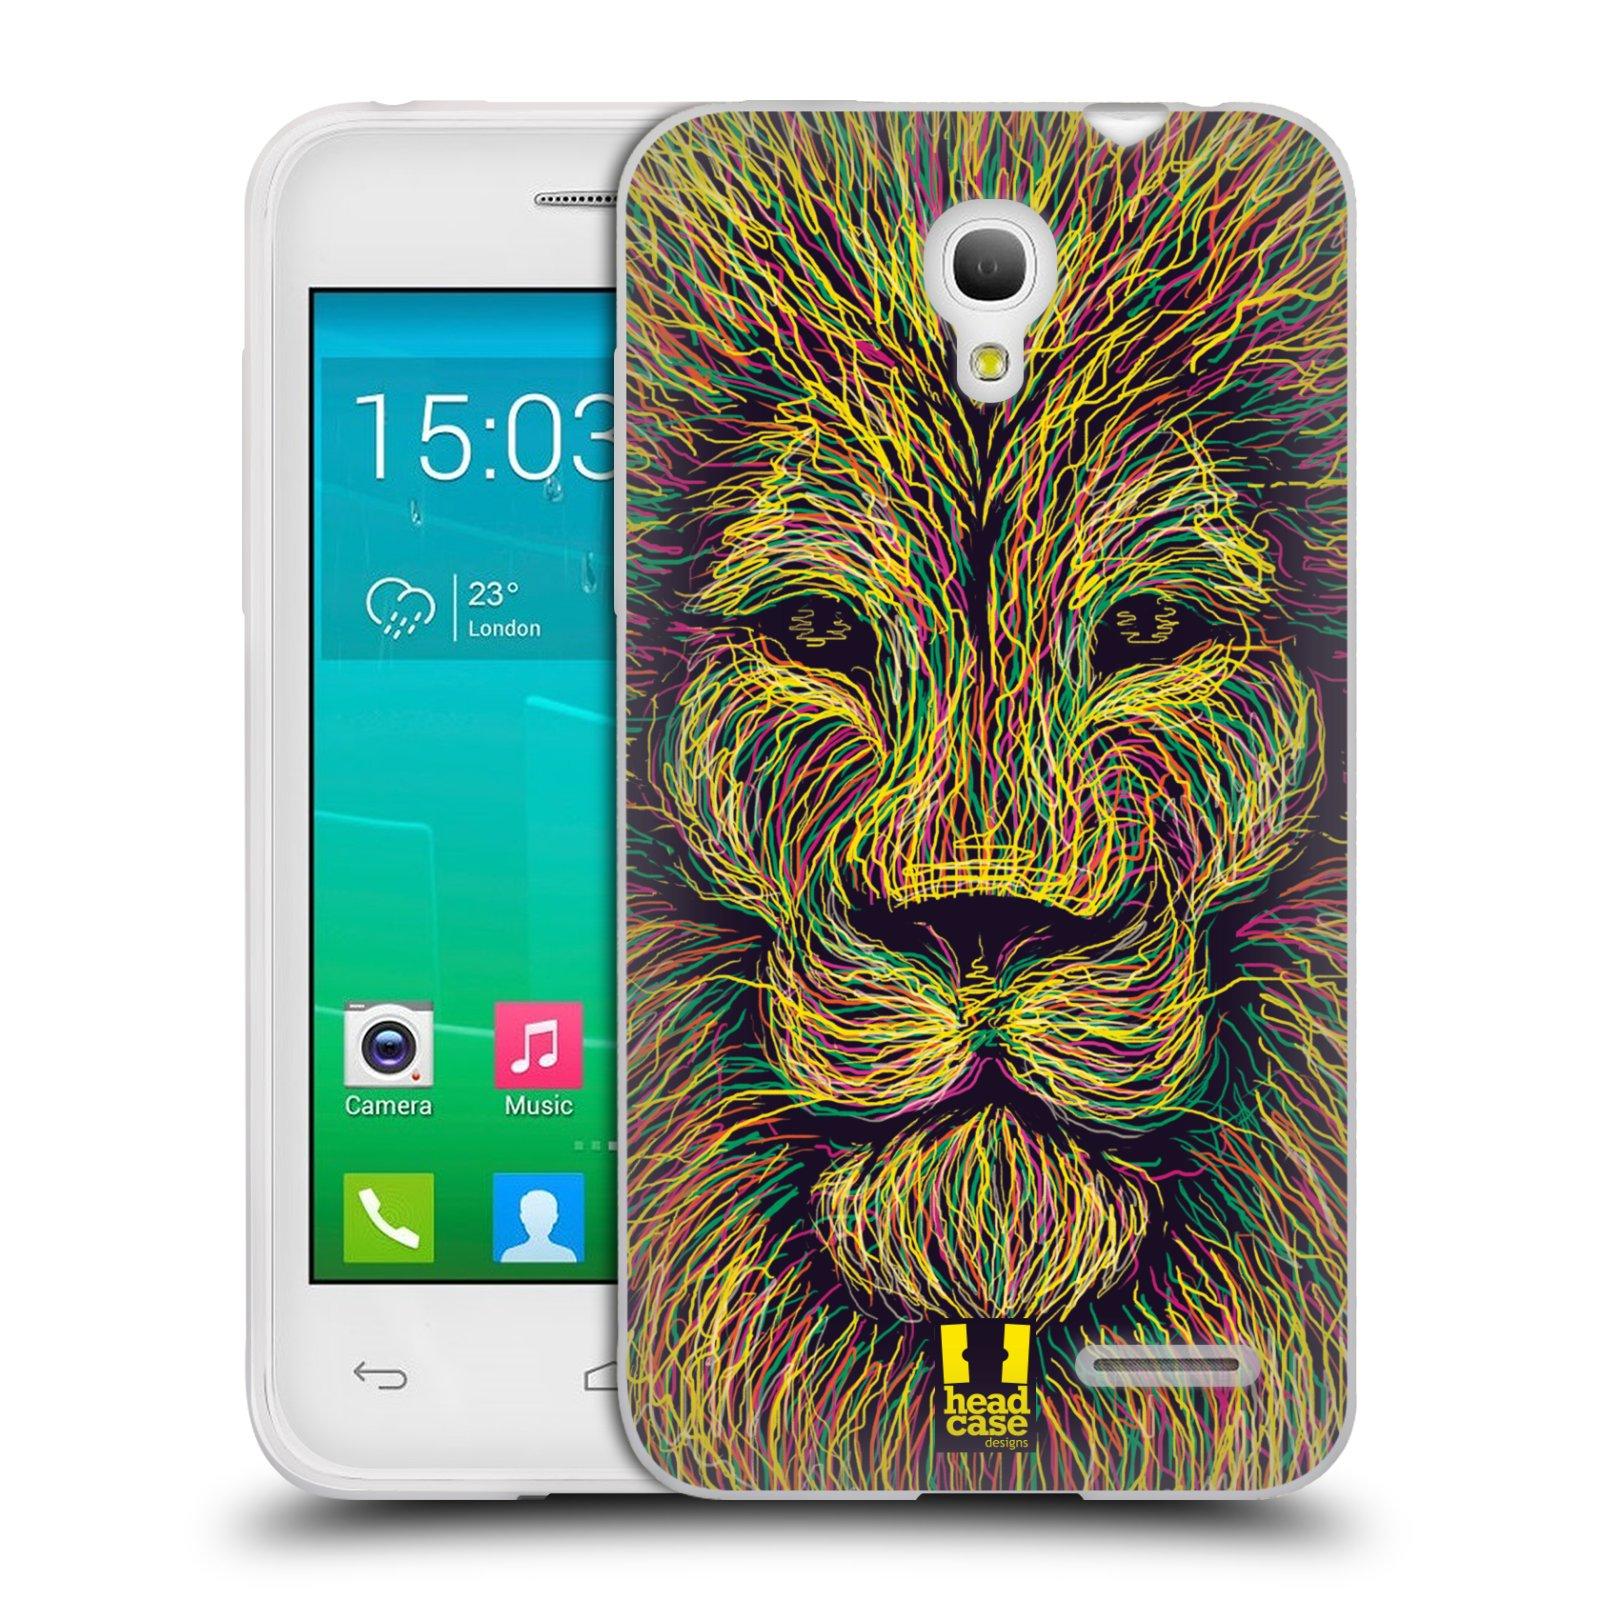 HEAD CASE silikonový obal na mobil Alcatel POP S3 OT-5050Y vzor zvíře čmáranice lev